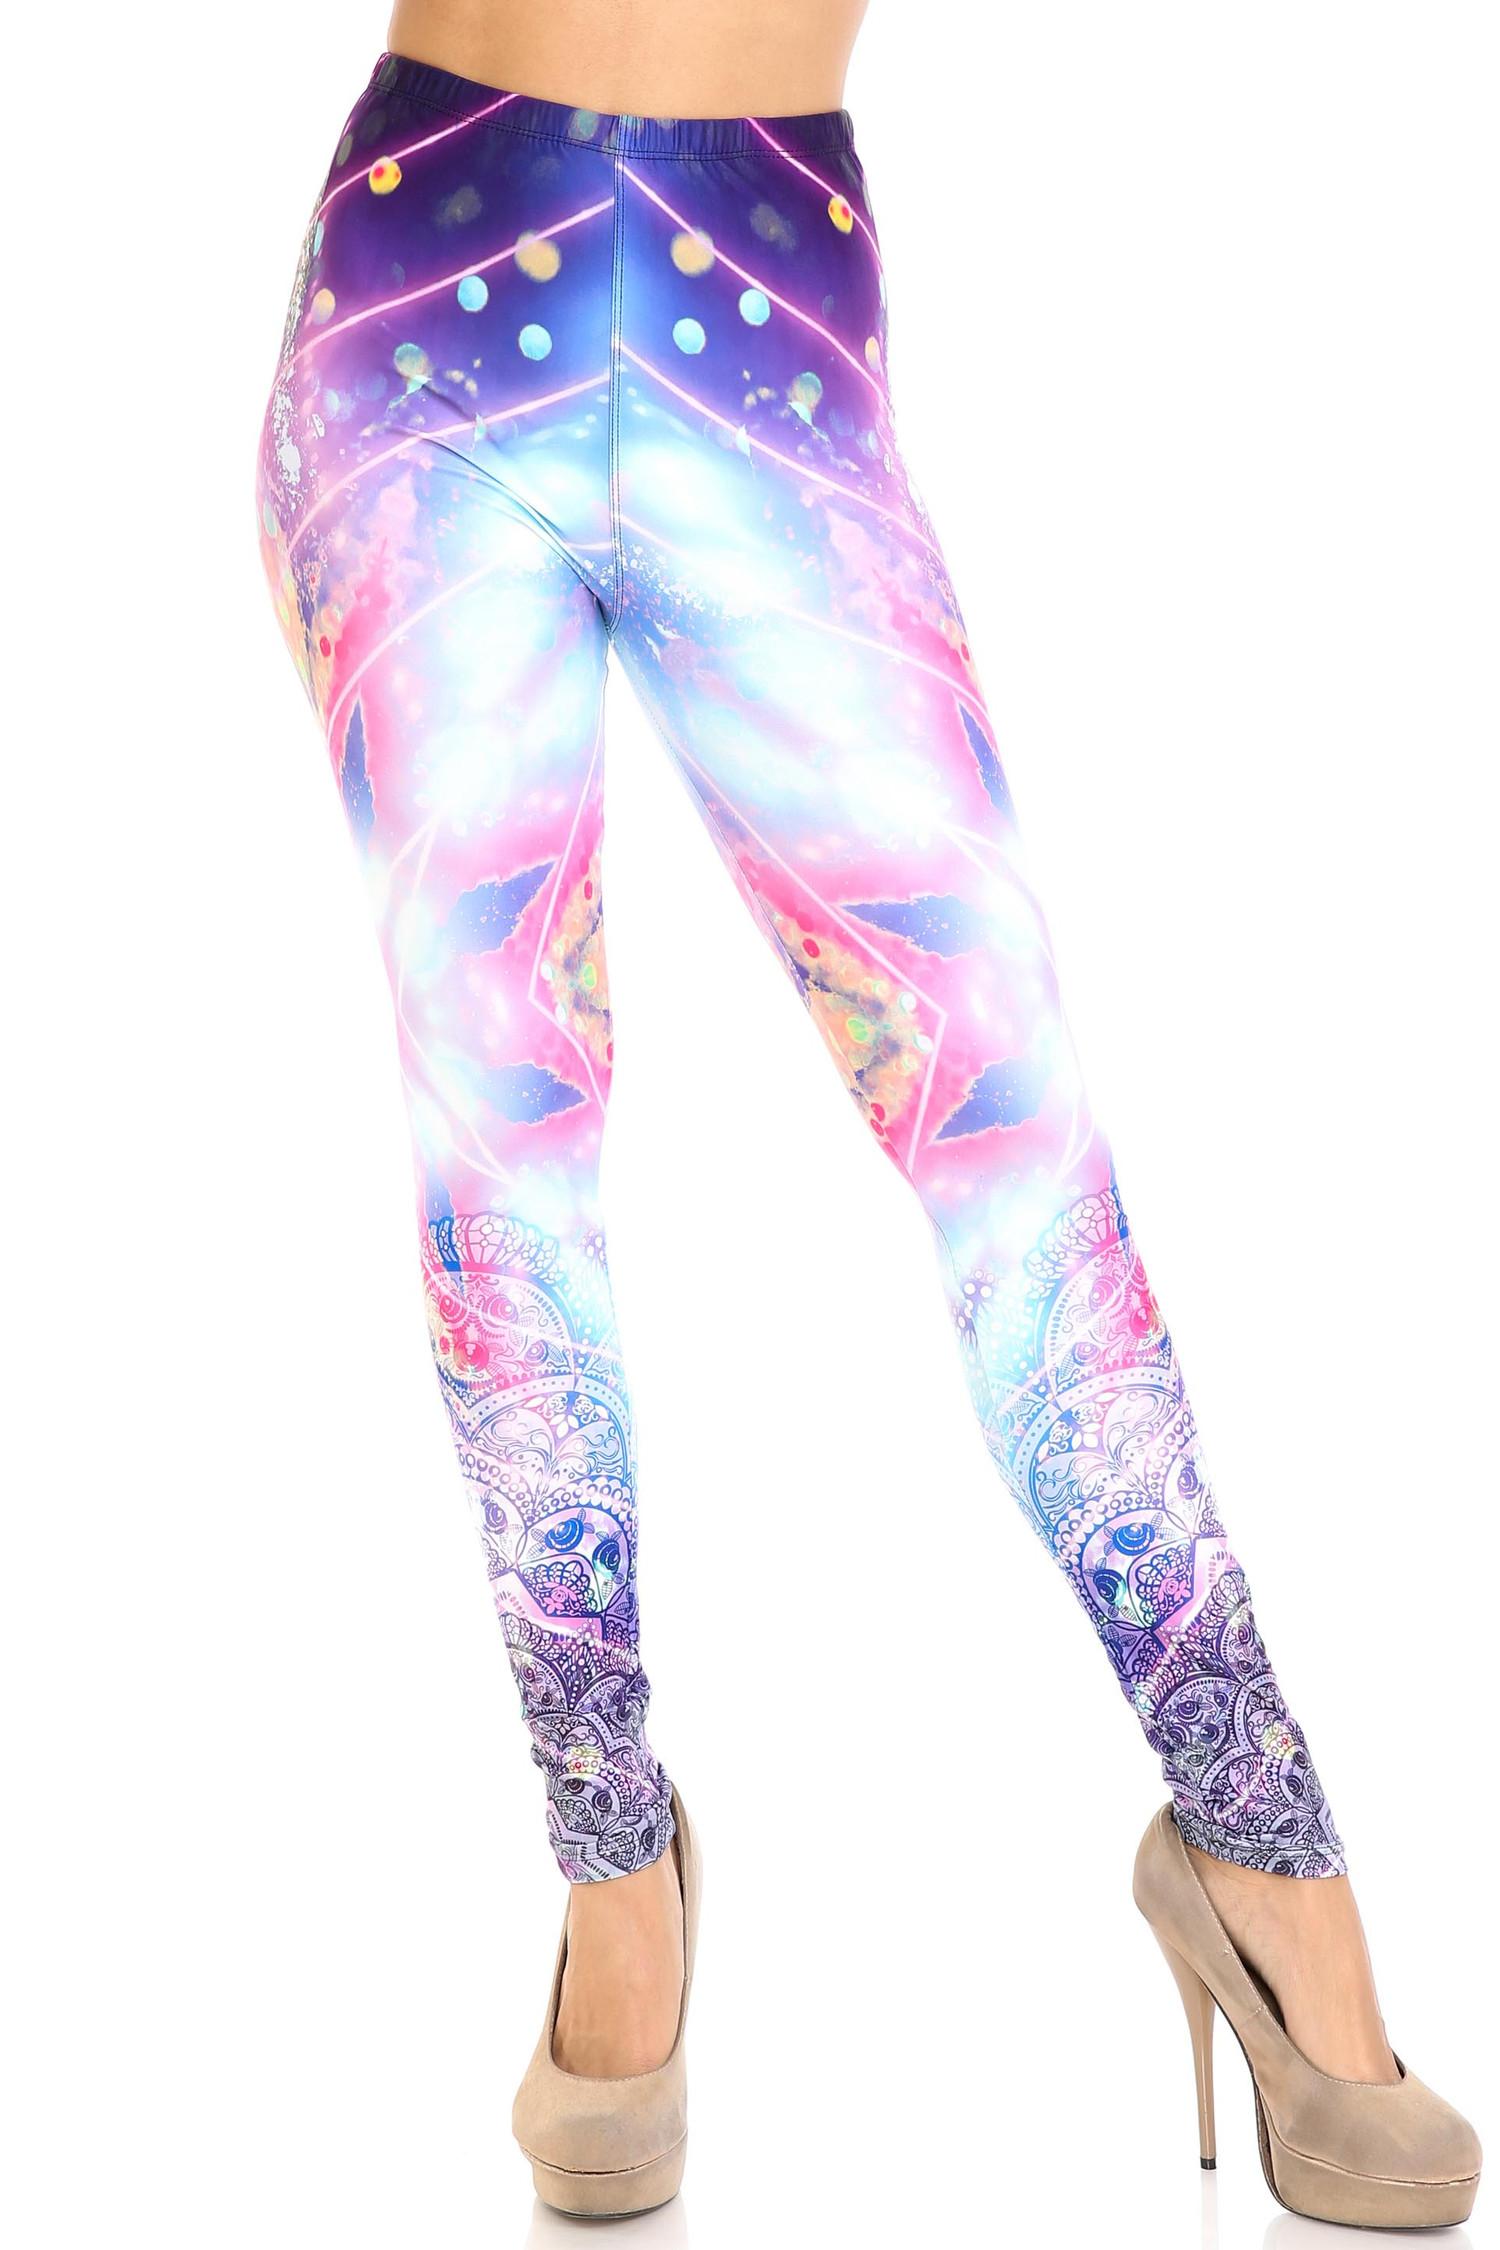 Creamy Soft Purple Mandala Lights Leggings - By USA Fashion™